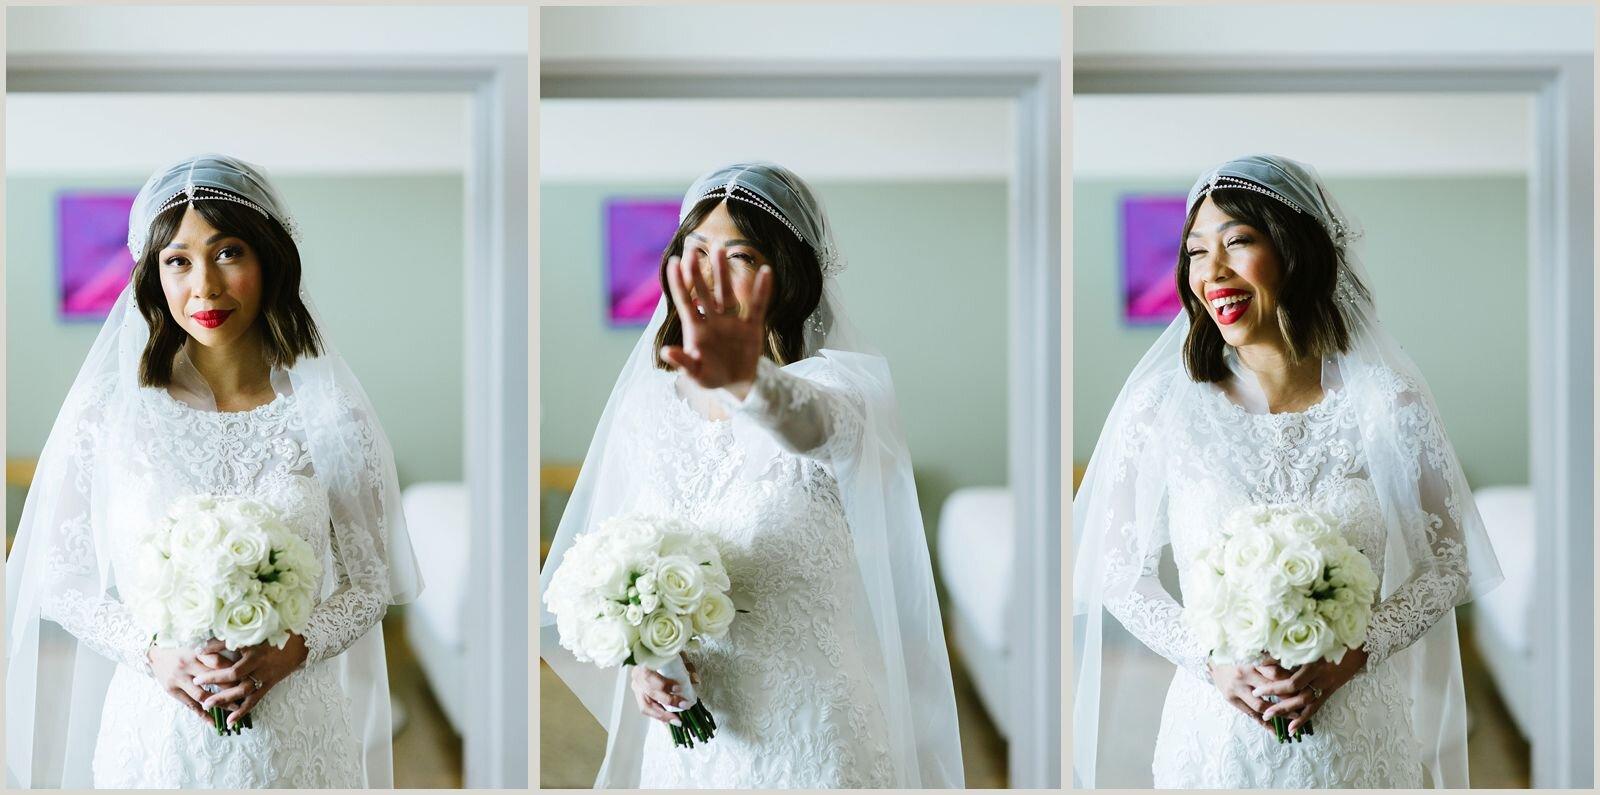 joseph_koprek_wedding_melbourne_the_prince_deck_0010.jpg